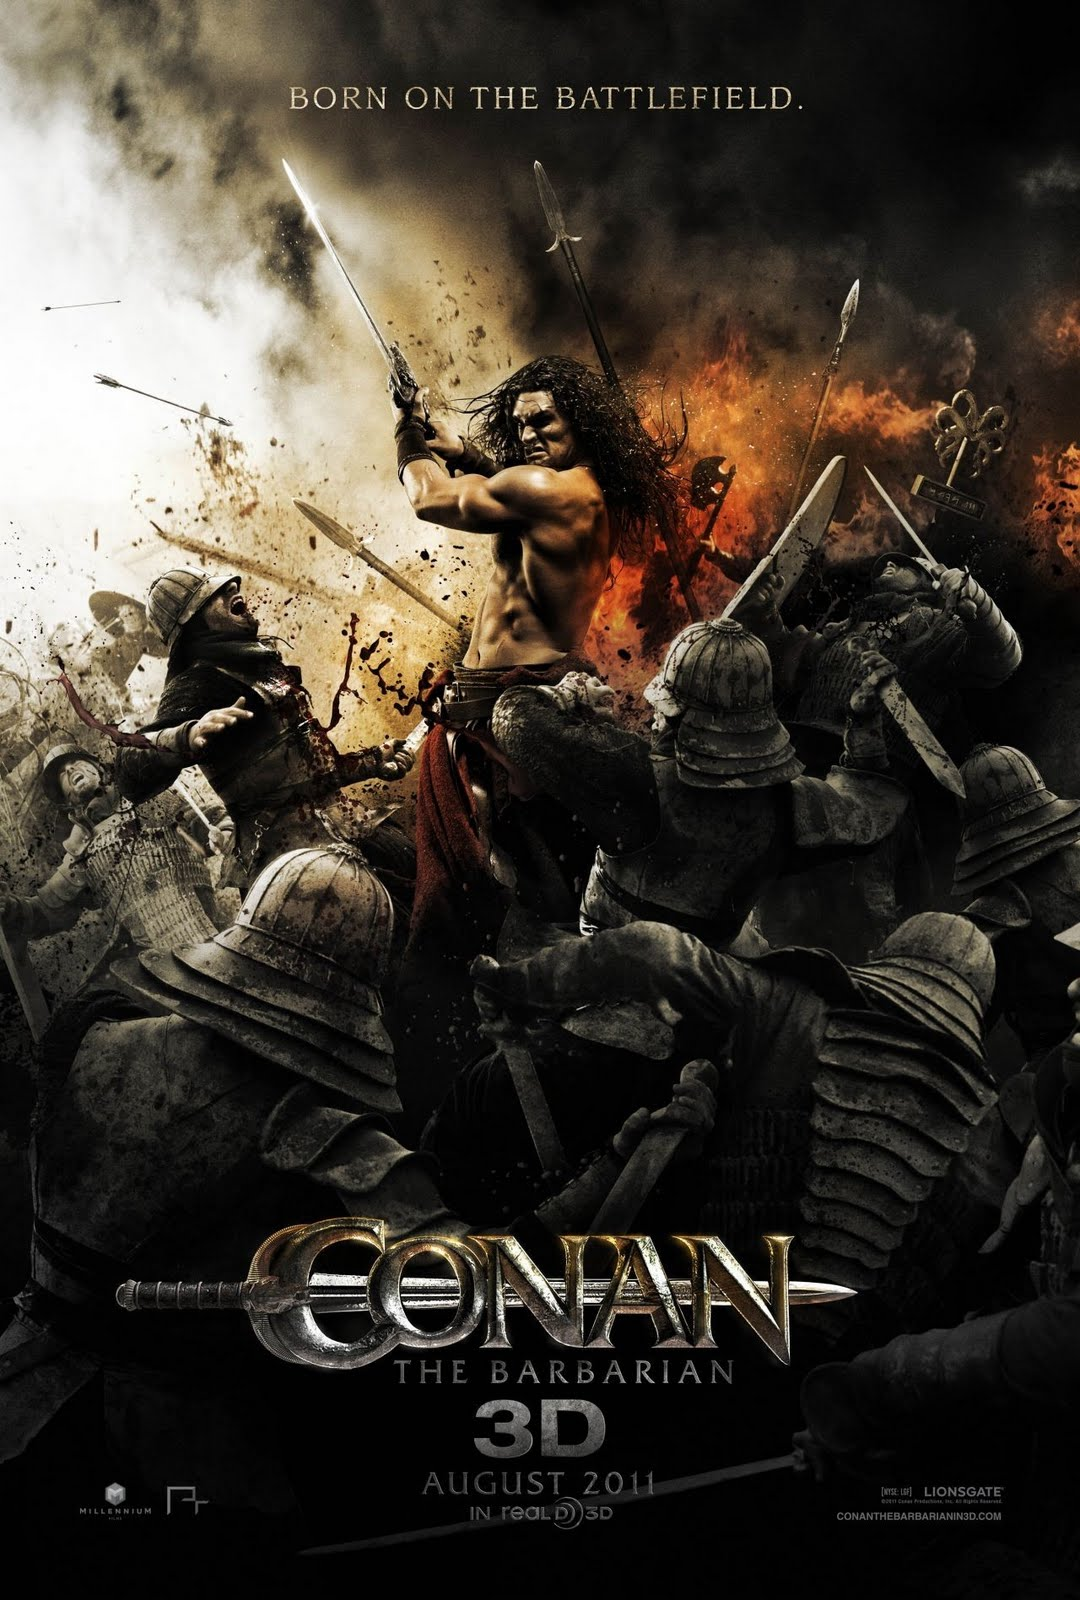 http://1.bp.blogspot.com/-hMOKkBq_-PY/TmjI_4GHmYI/AAAAAAAALqM/vYK_-U6BSSA/s1600/Conan+The+Barbarian+2011+Poster.jpg